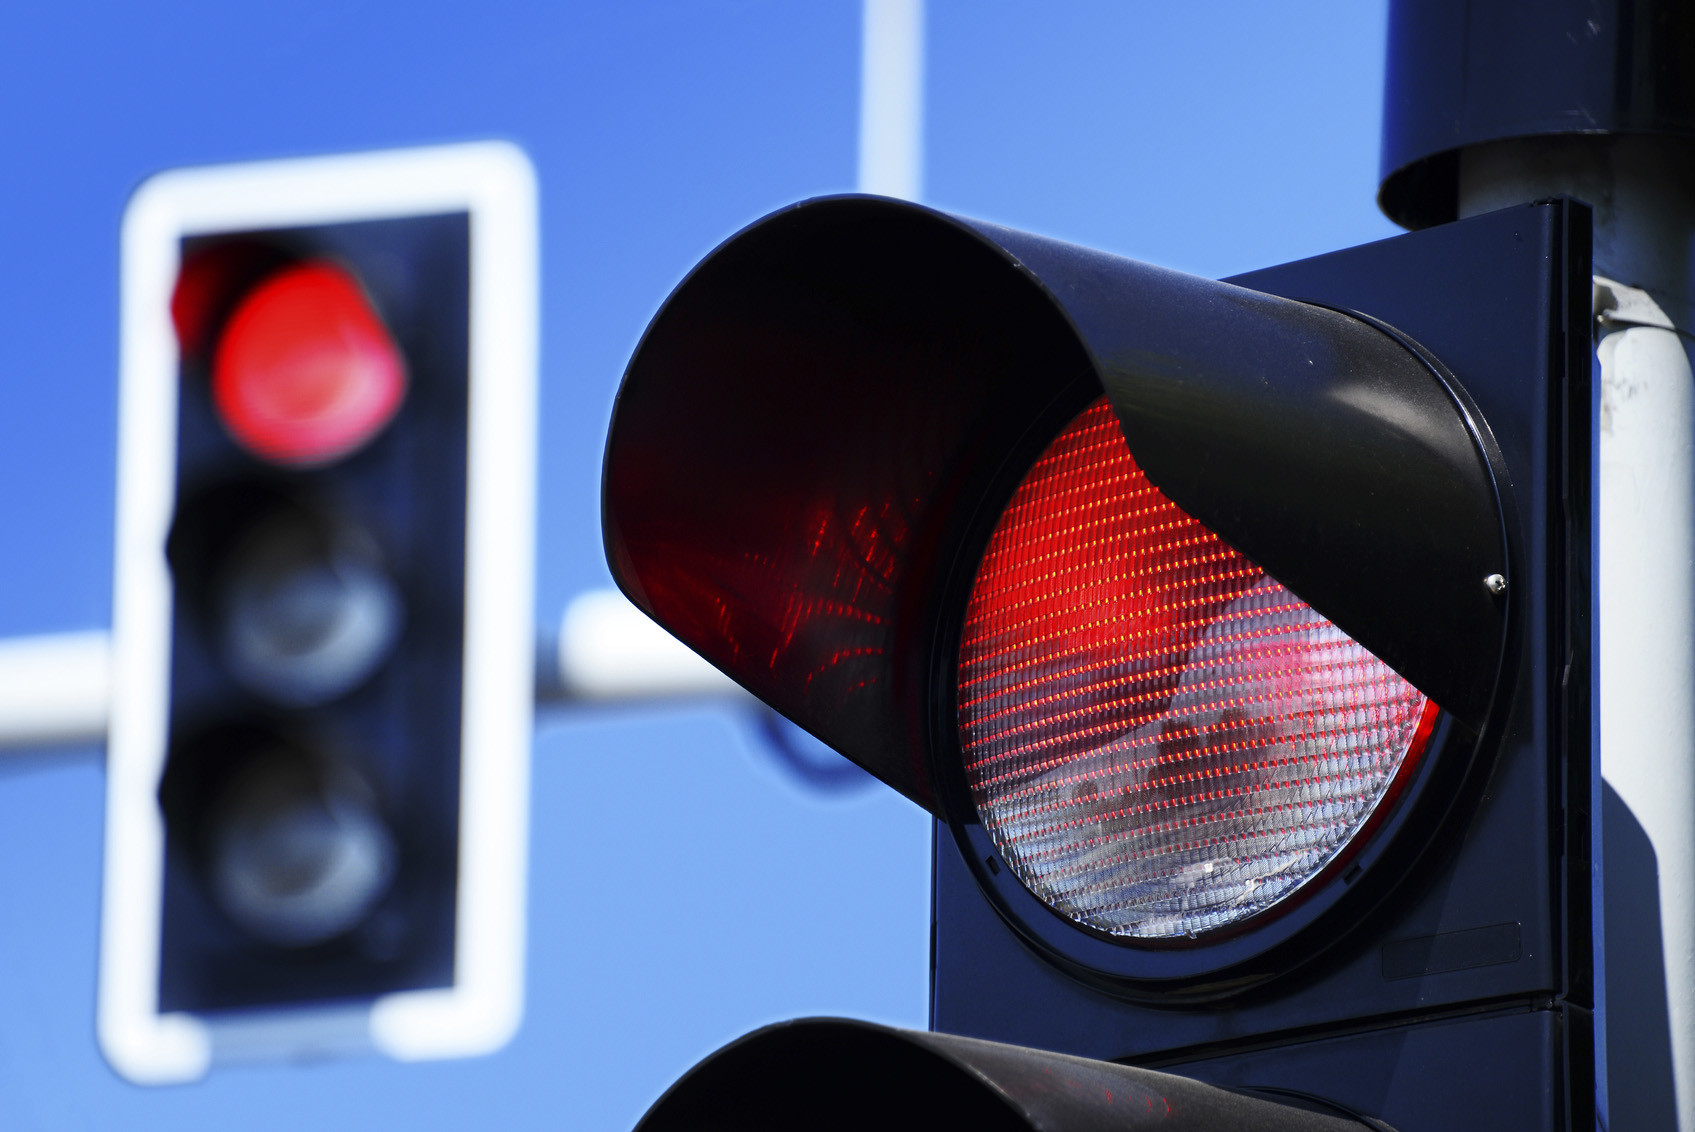 Traffic lights over blue sky. Red light.